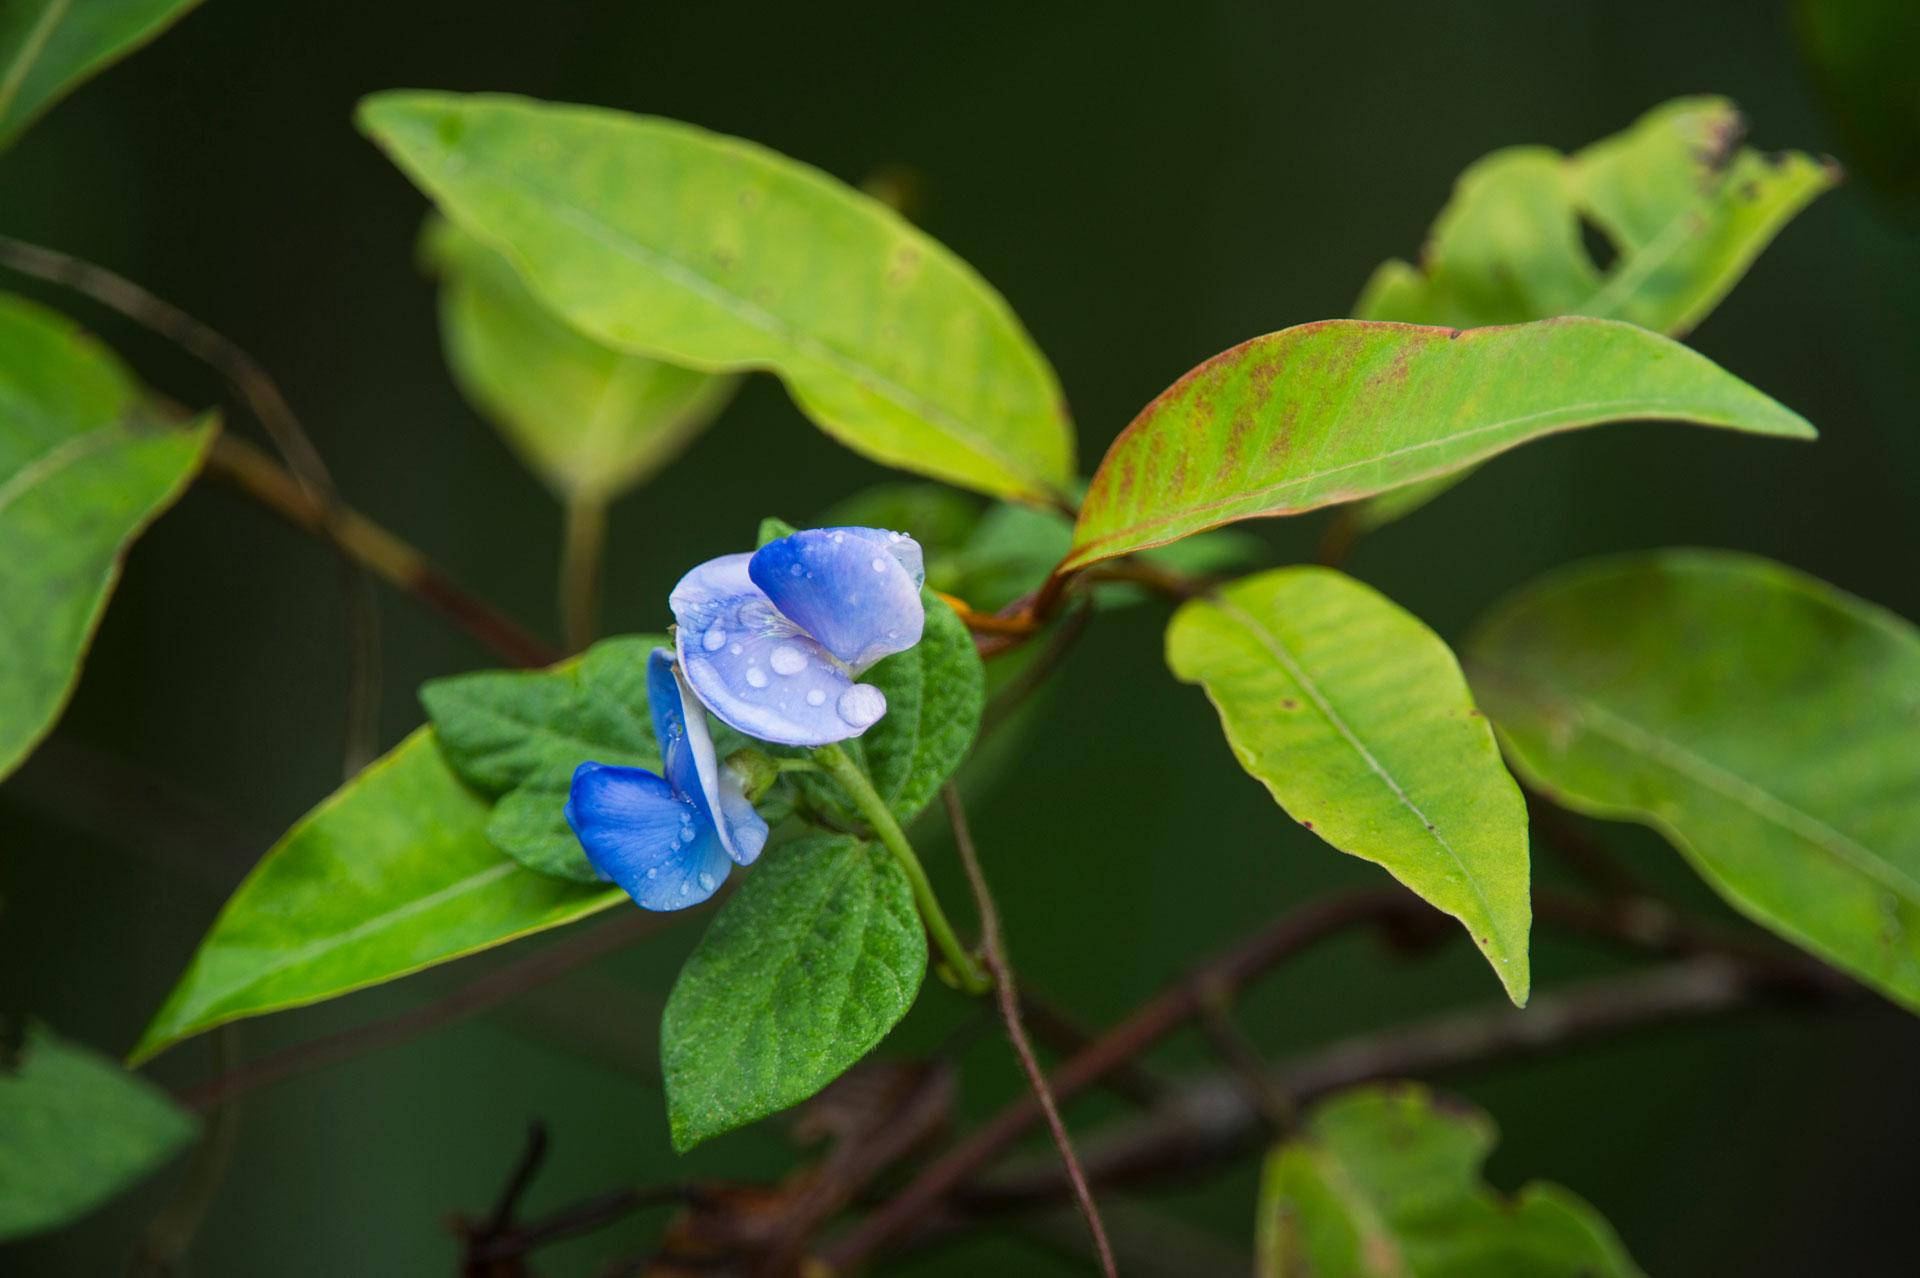 Rainforest flower in Odzala-Kokoua National Park